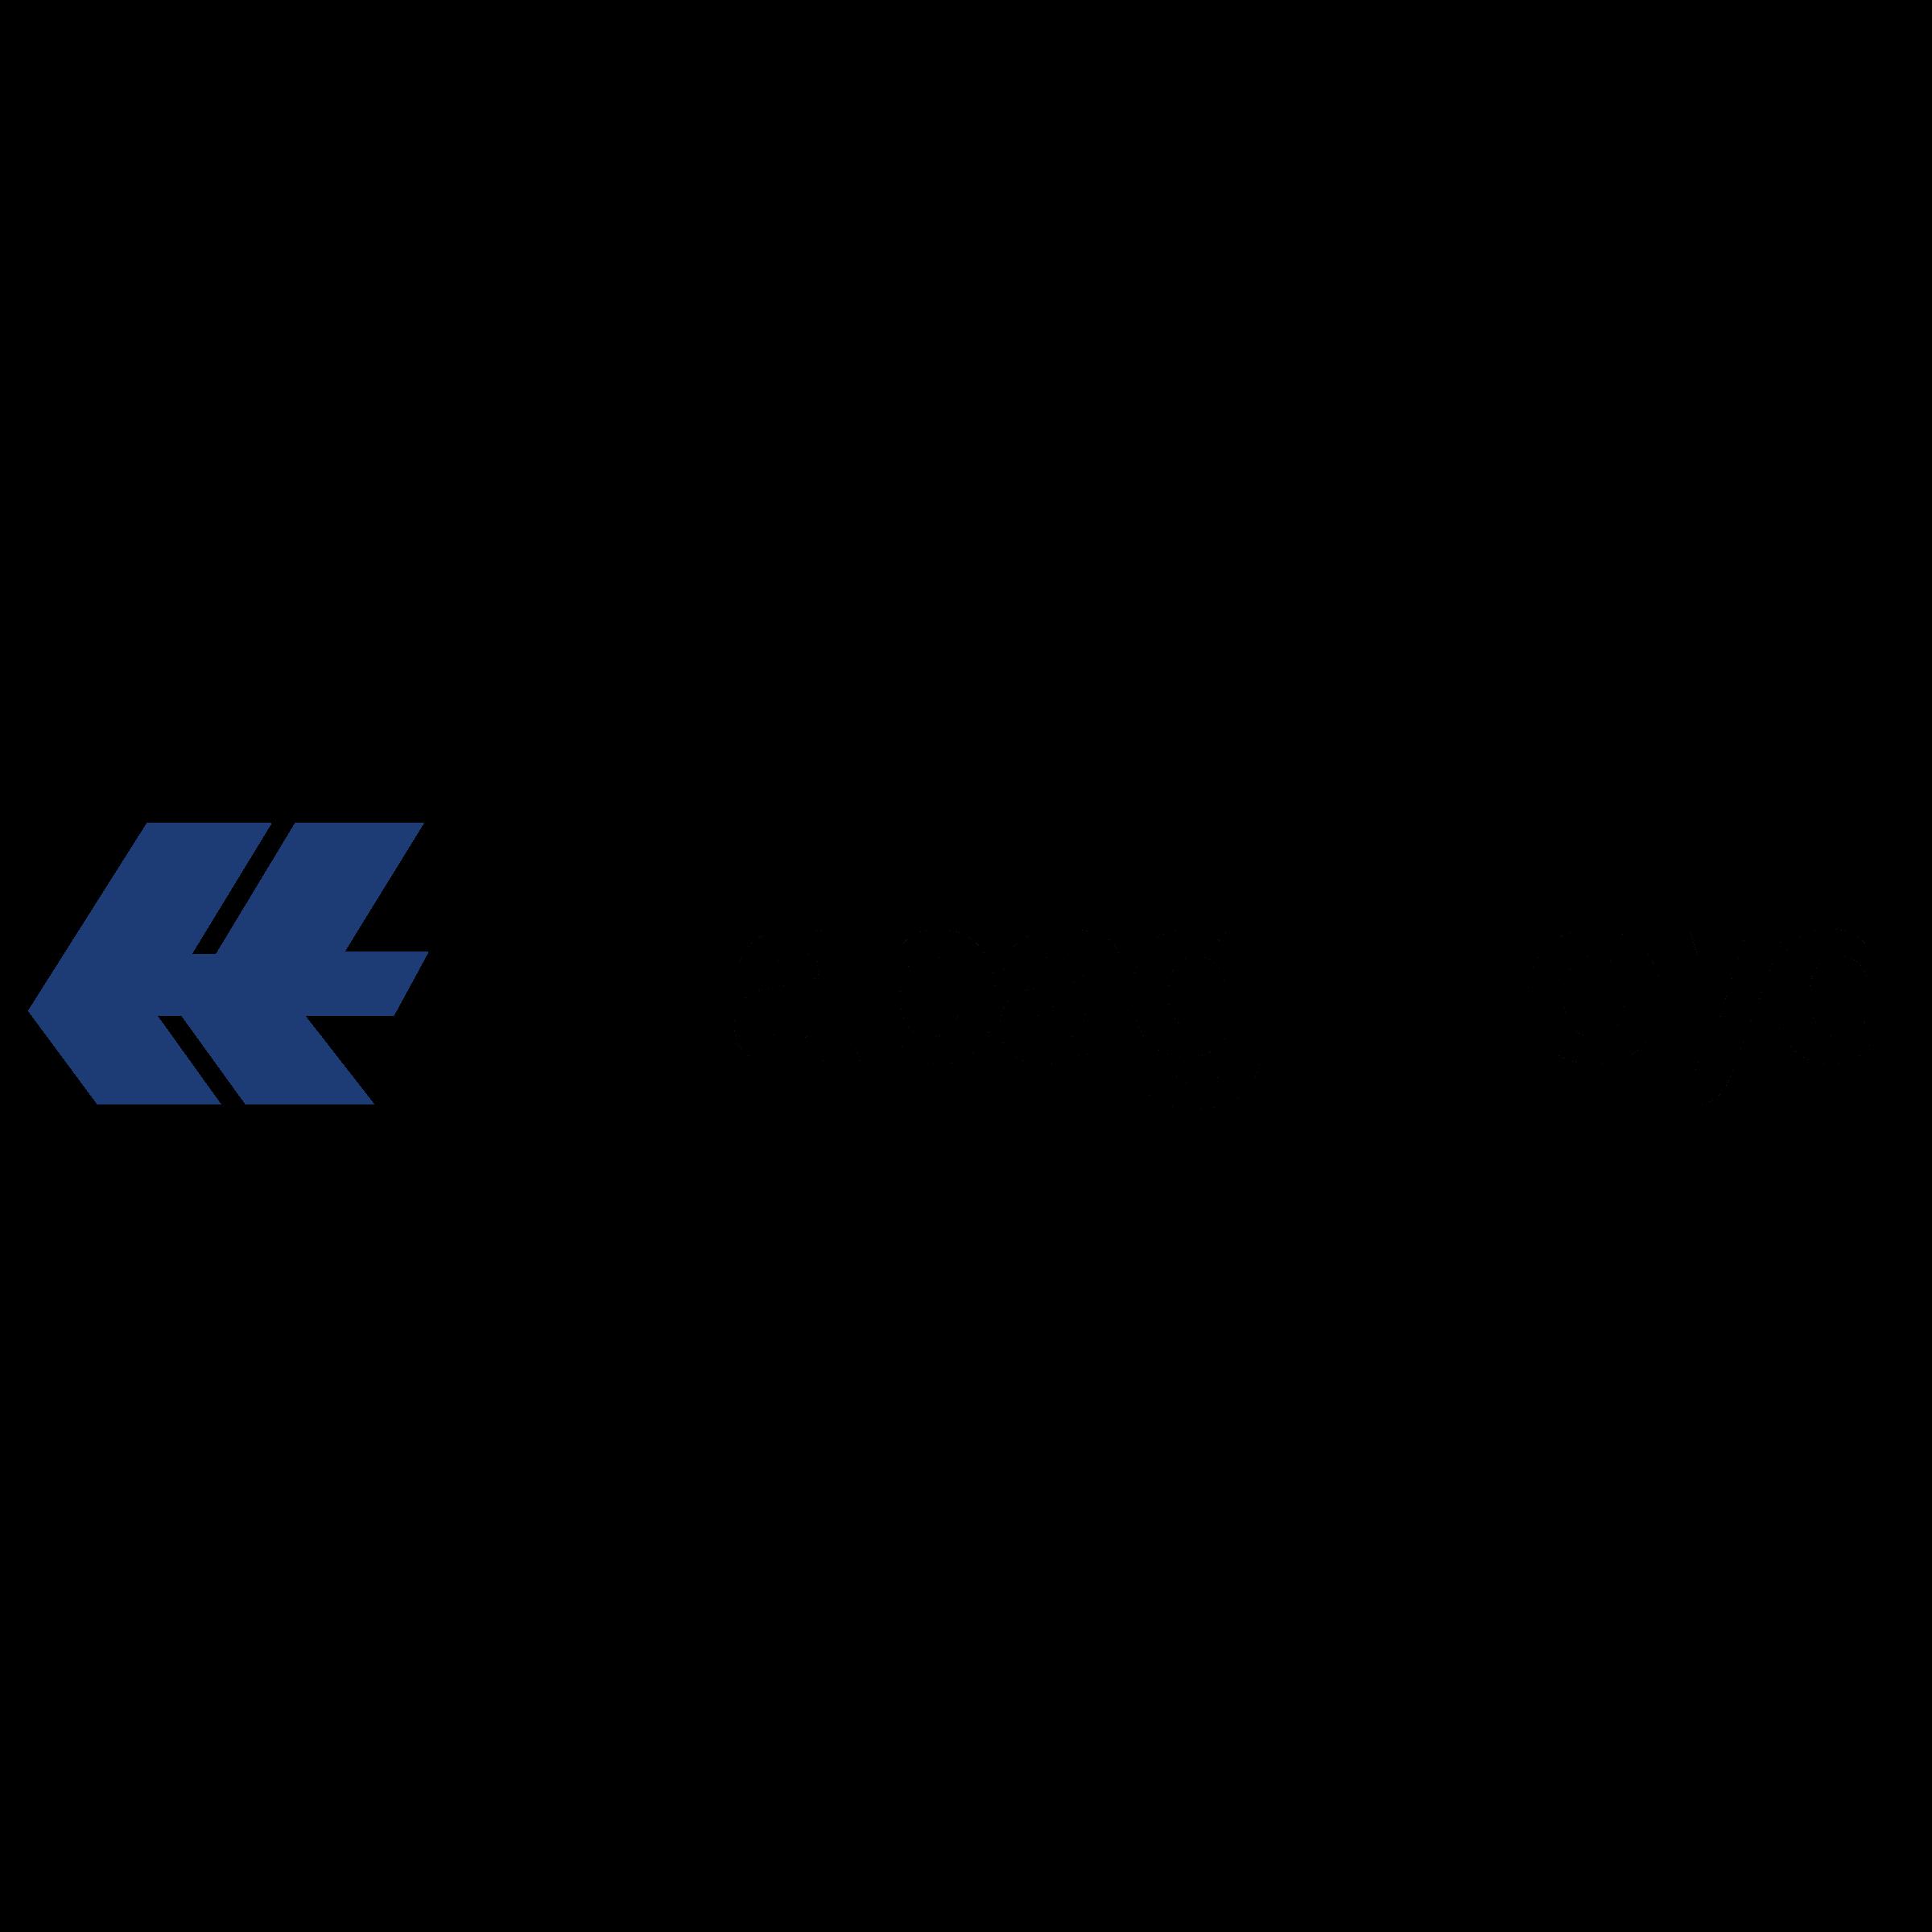 logo Hapag Lloyd